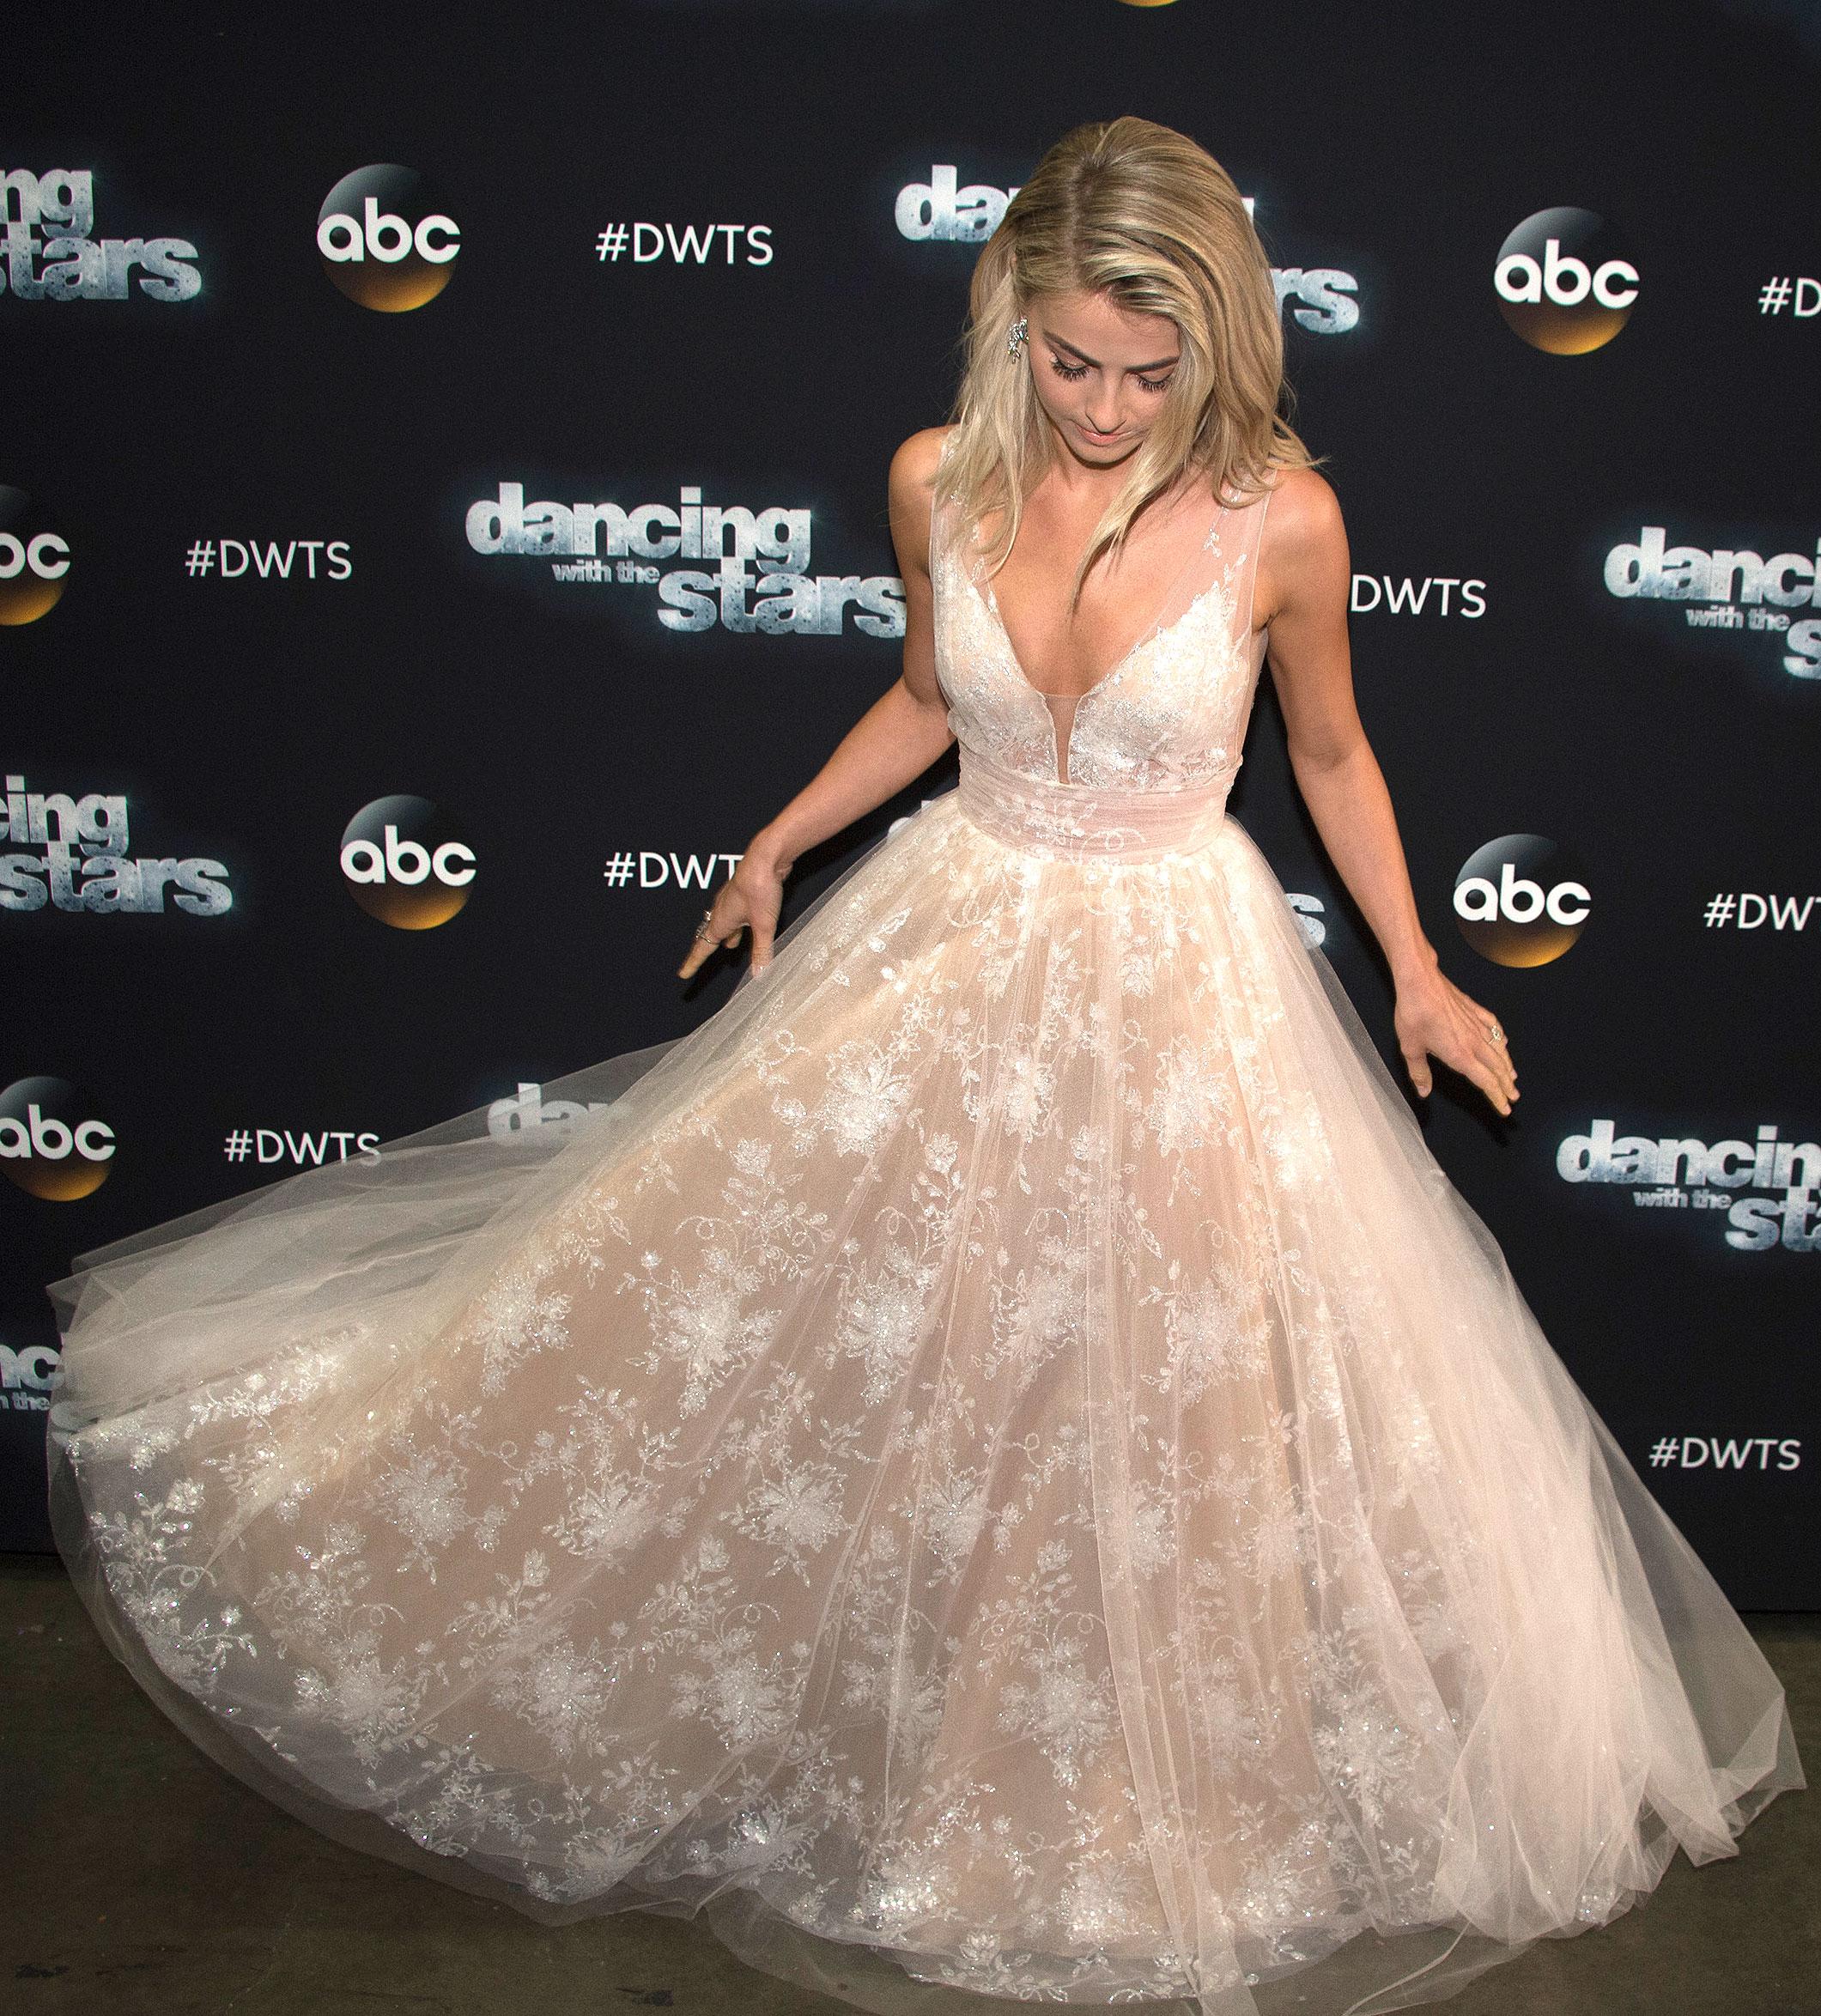 Julianne Hough Wedding Dress.Julianne Hough Wears Bridal Dress On Dancing With The Stars